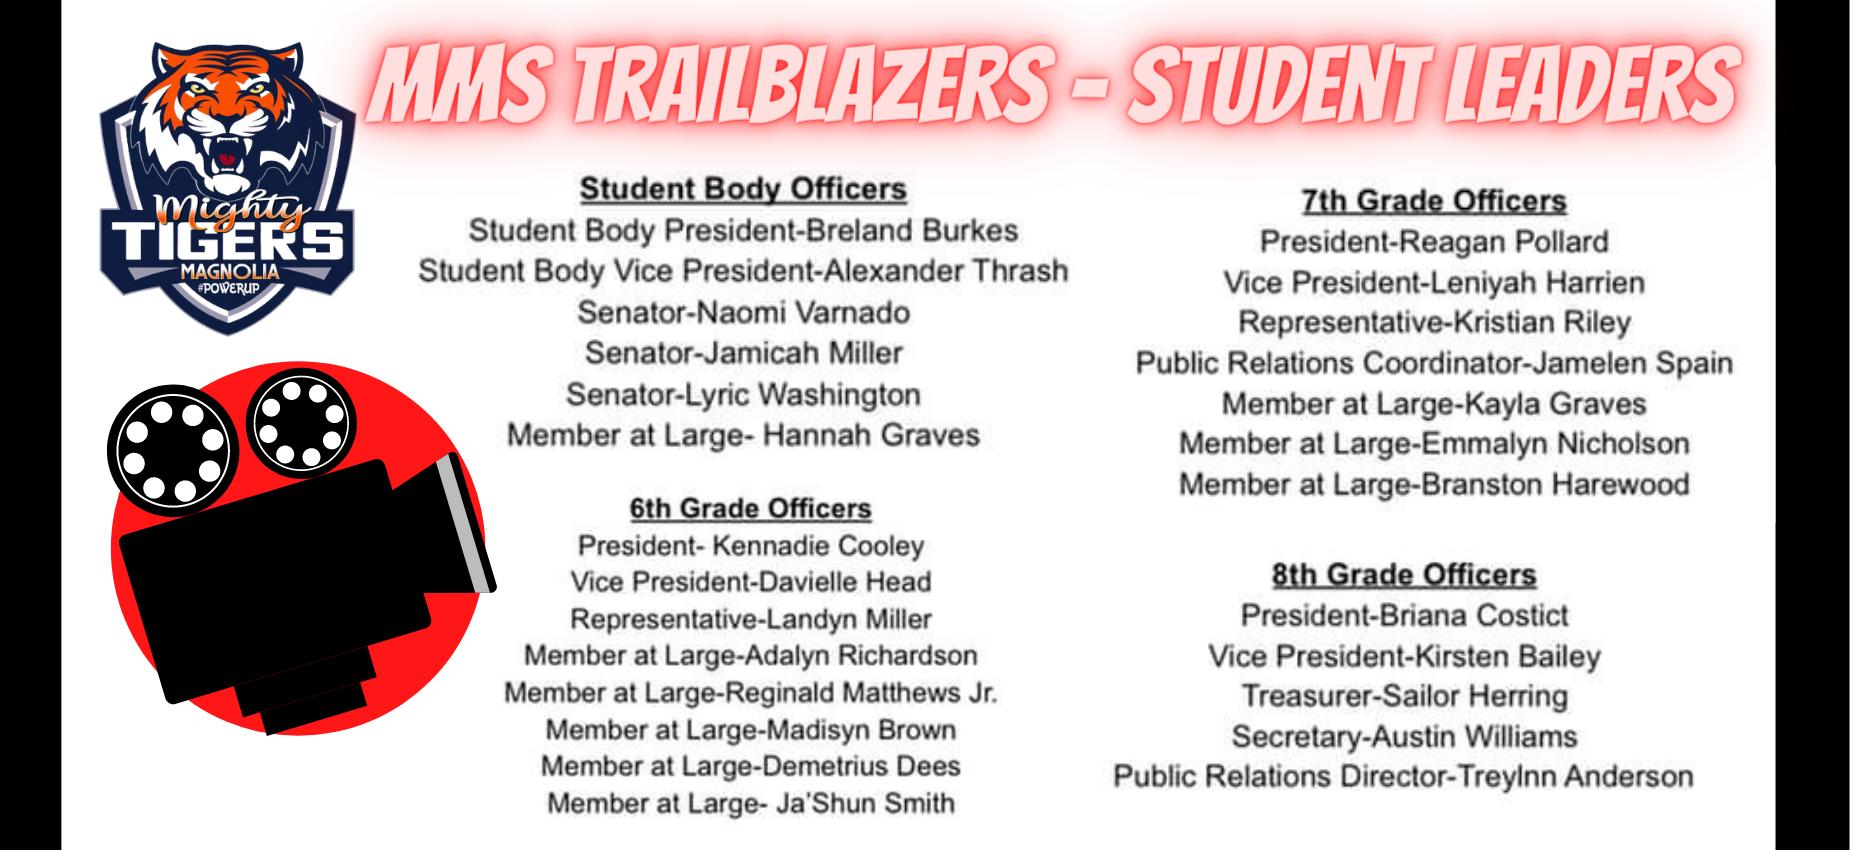 2021 - 2022 - MMS Trailblazers - Student Leaders